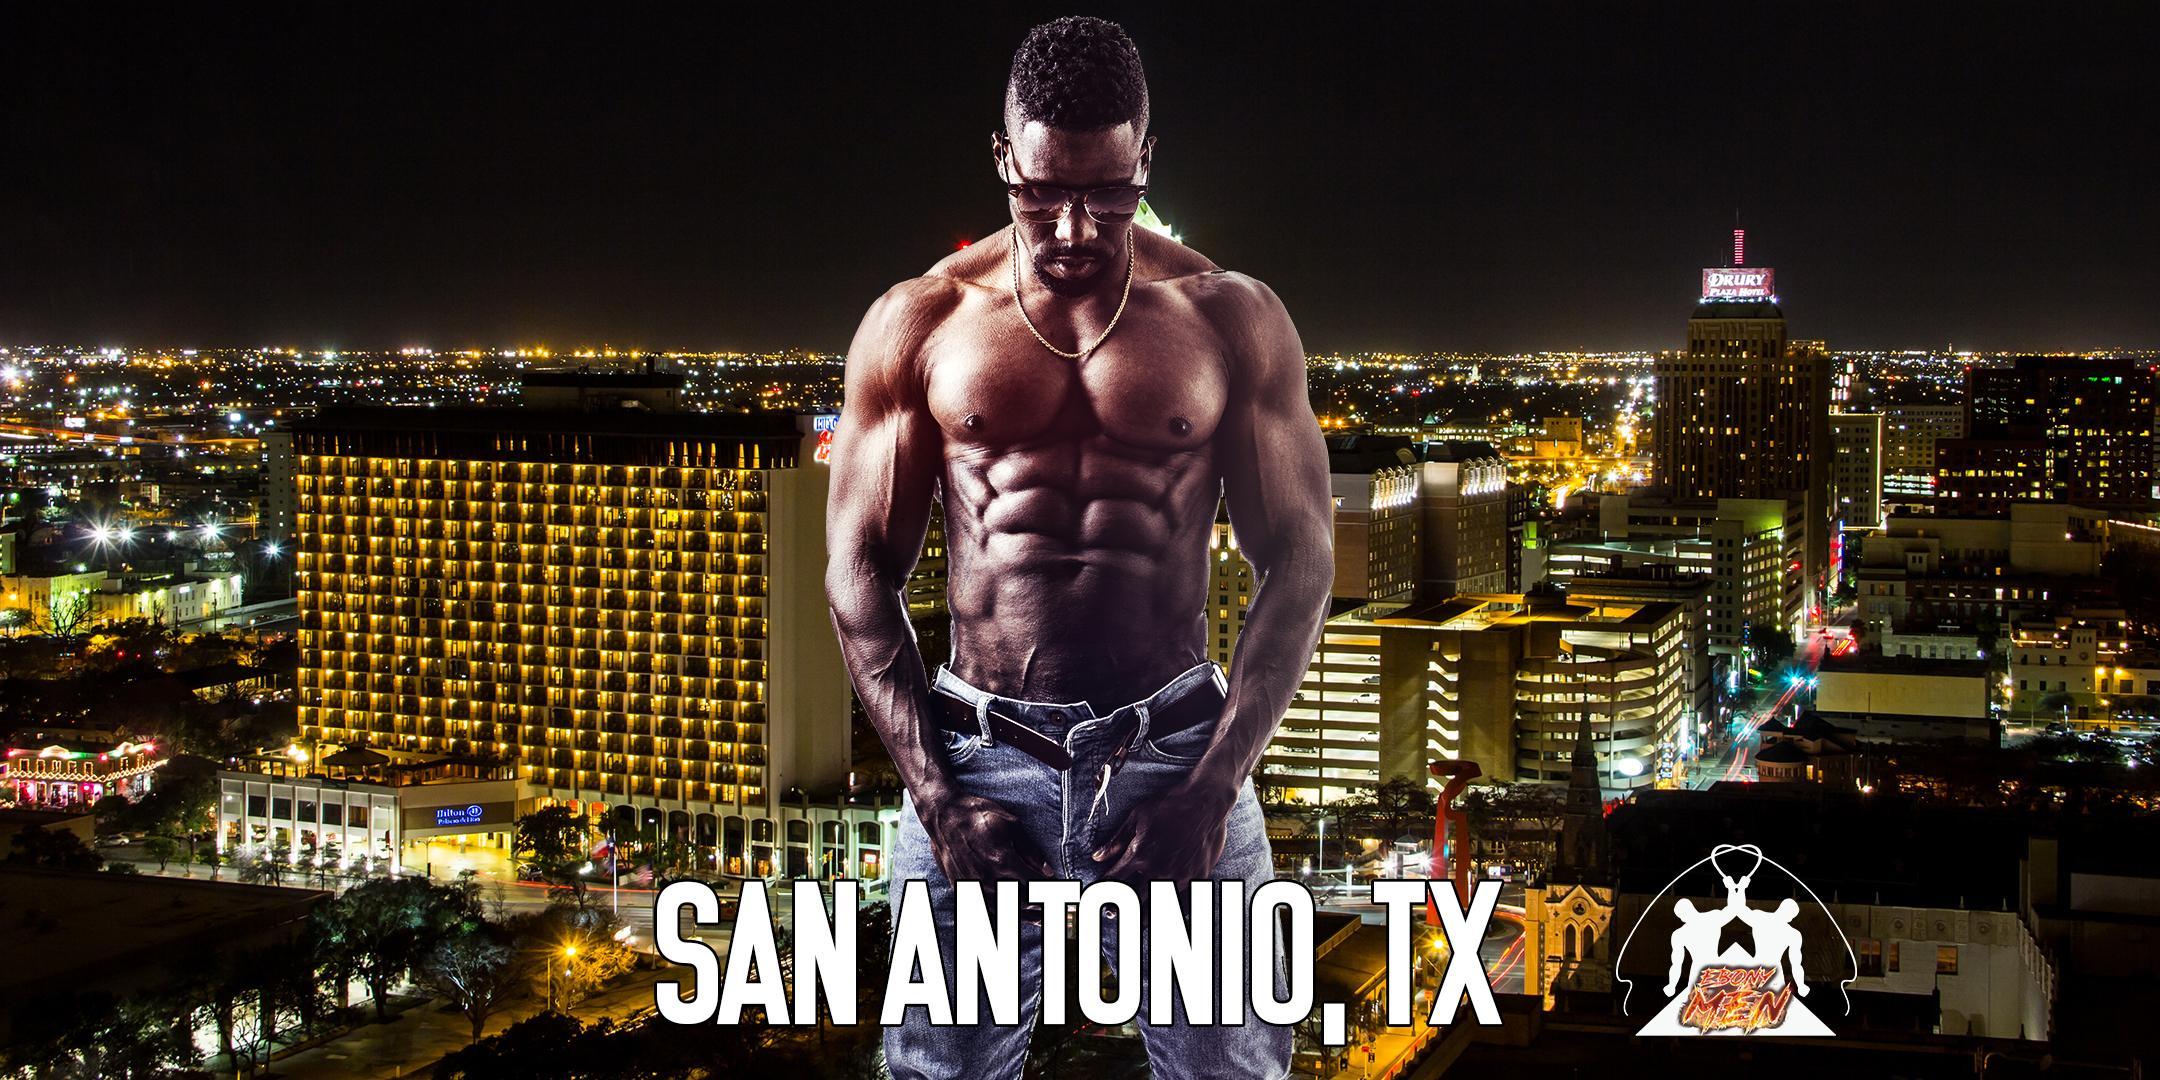 Ebony Men Black Male Revue Strip Clubs & Black Male Strippers San Antonio TX NC 8-10PM